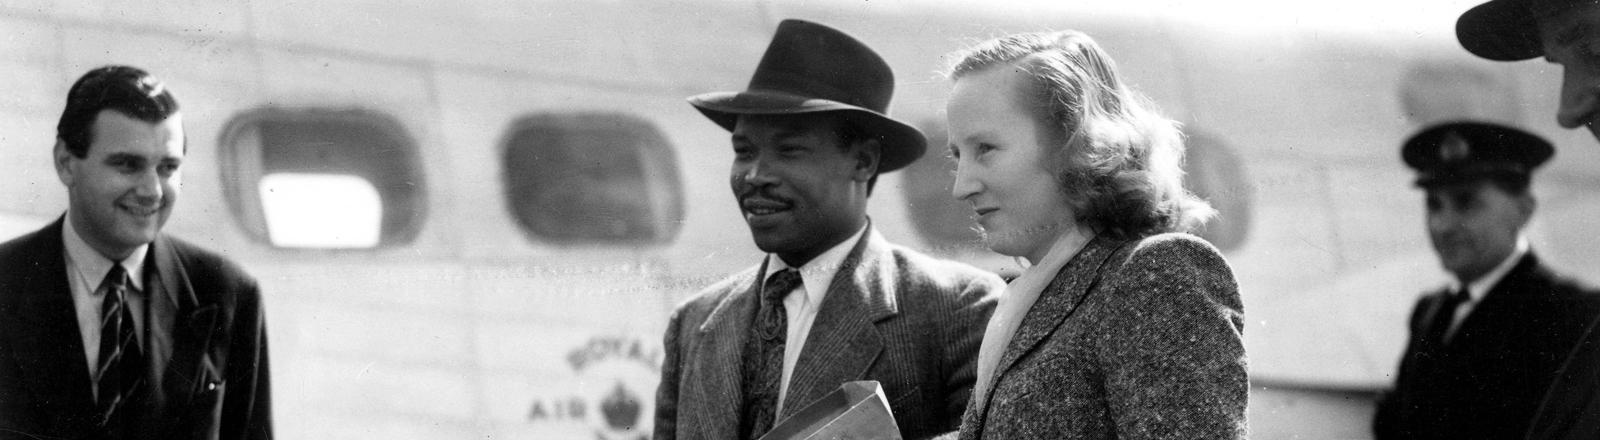 Seretse Khama und seine Frau Ruth in Southhampton